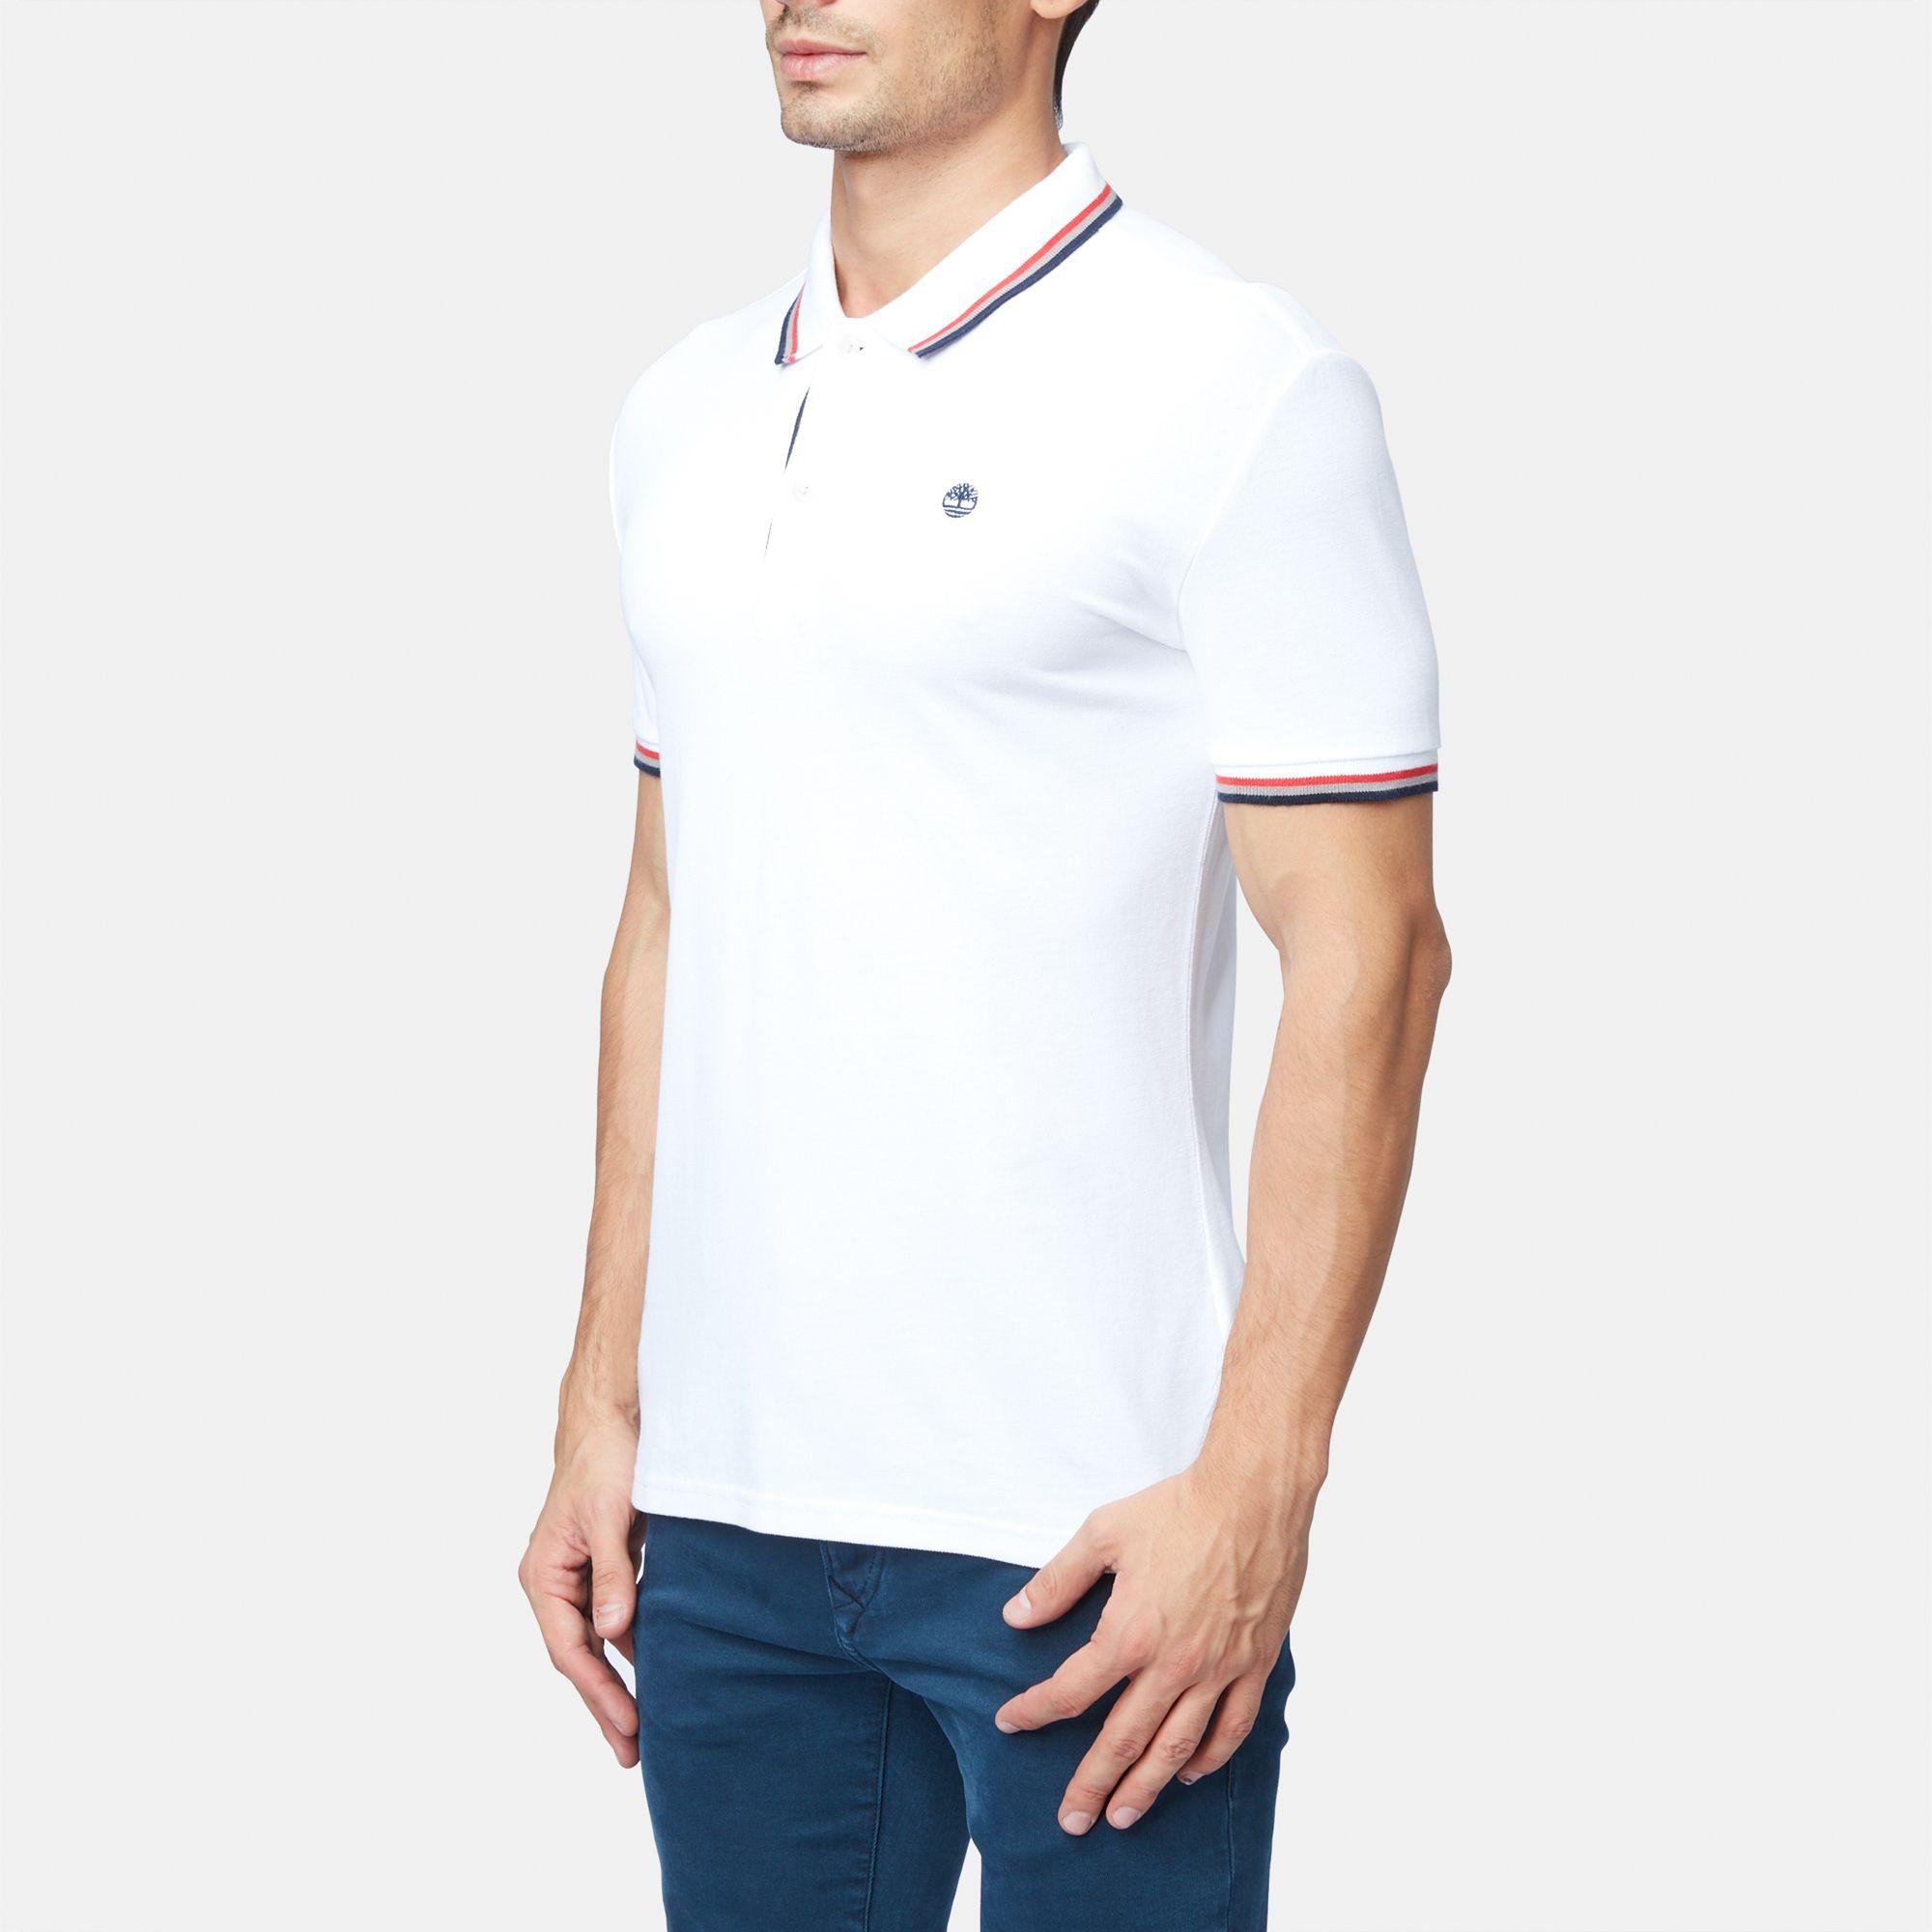 Timberland Eastham Pique Sail Polo T Shirt Polo Shirts Tops